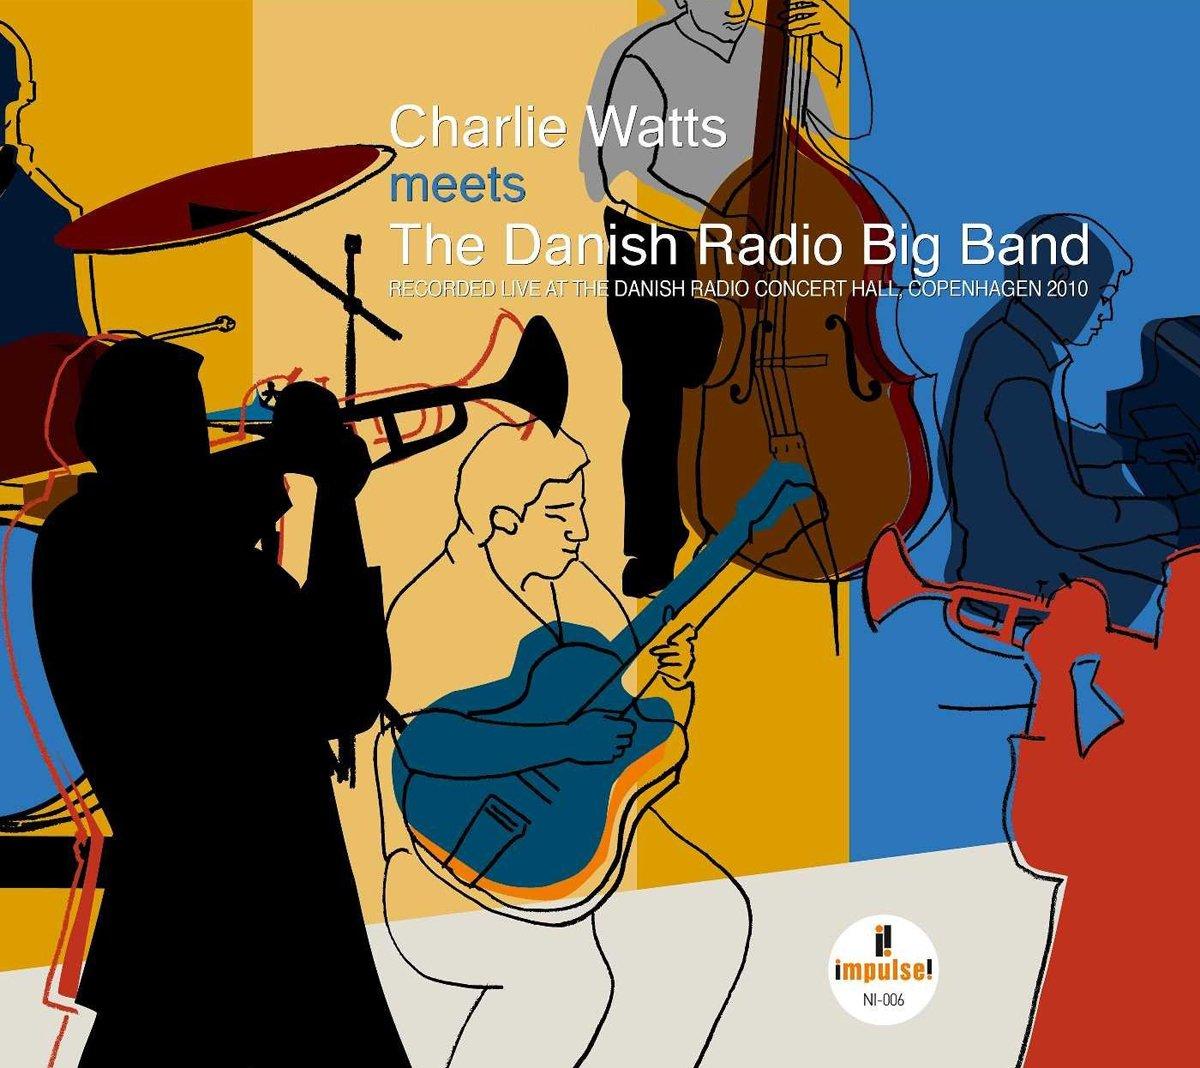 Charlie Watts Meets The Danish Radio Big Band: The Danish Radio Big Band, The Danish Radio Big Band, Woody Herman, Sammy Cahn, Paul Weston, Mick Jagger, Keith Richards, Jim Keltner, Charlie Watts,